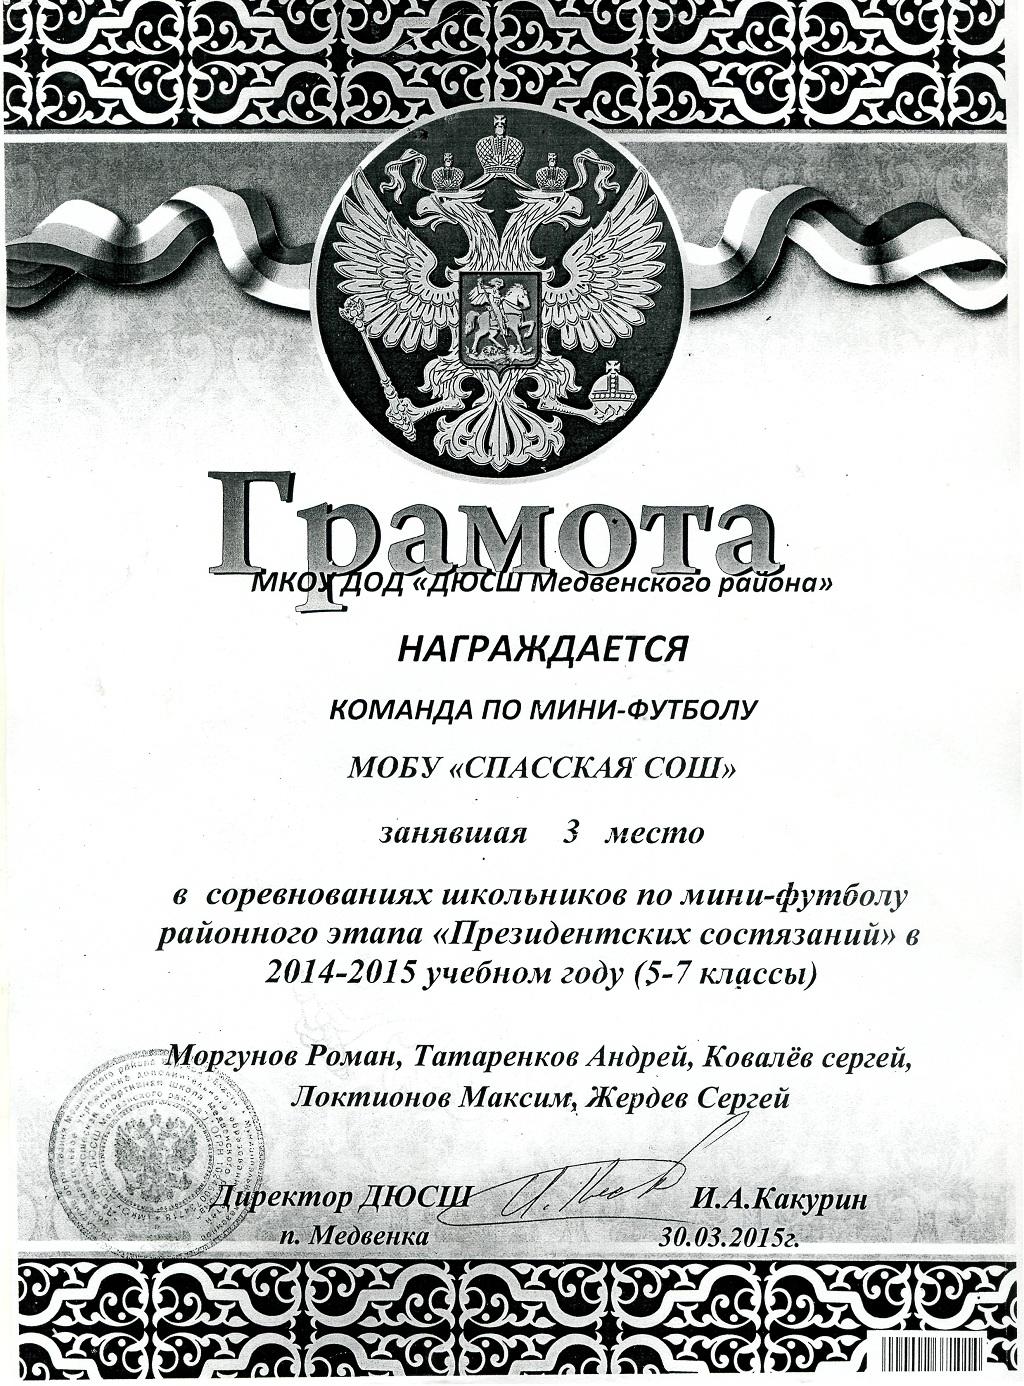 gramota-3